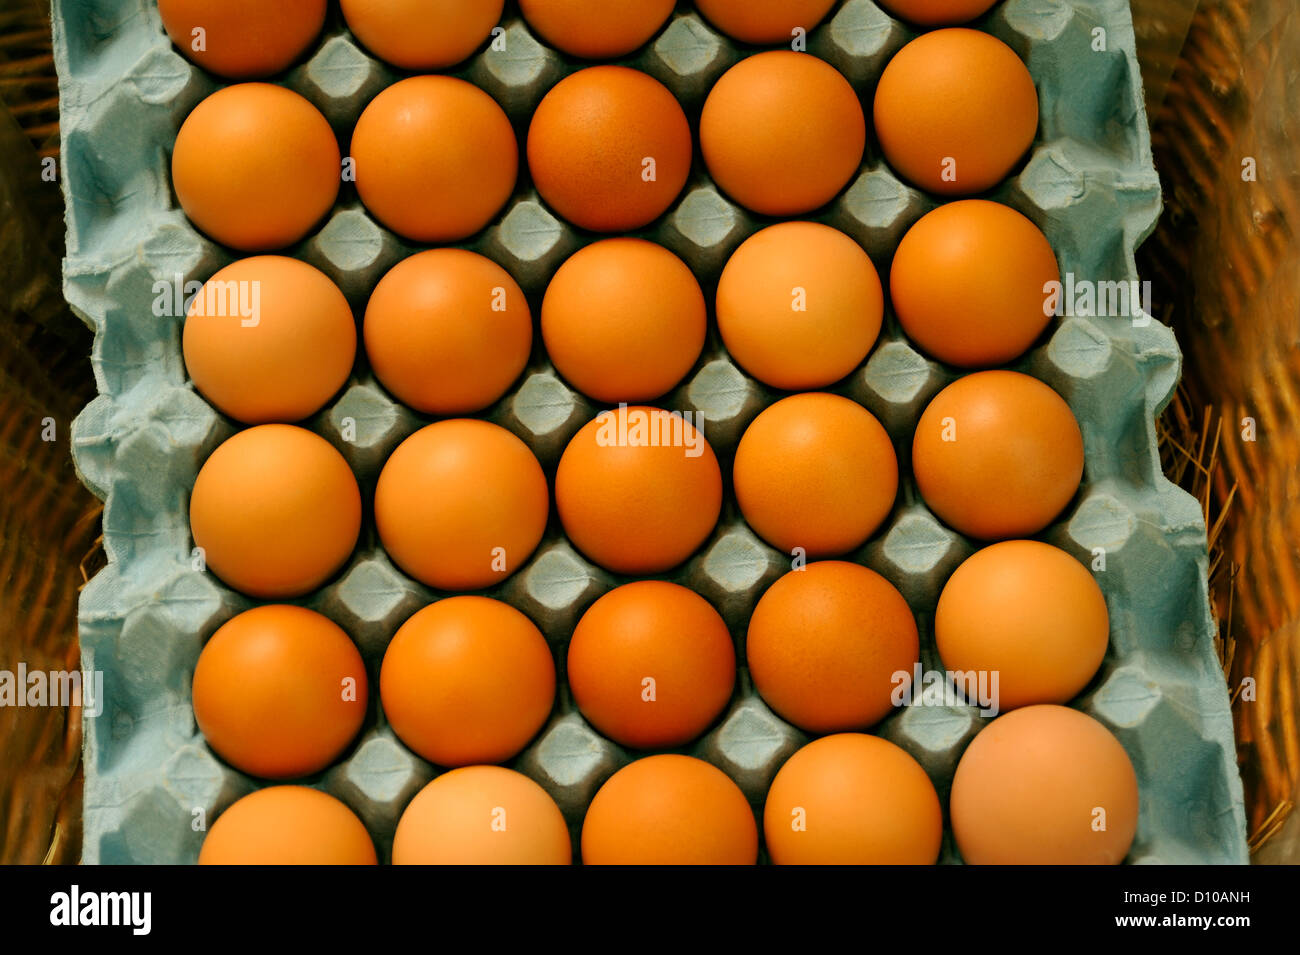 FRESH BROWN EGGS - Stock Image